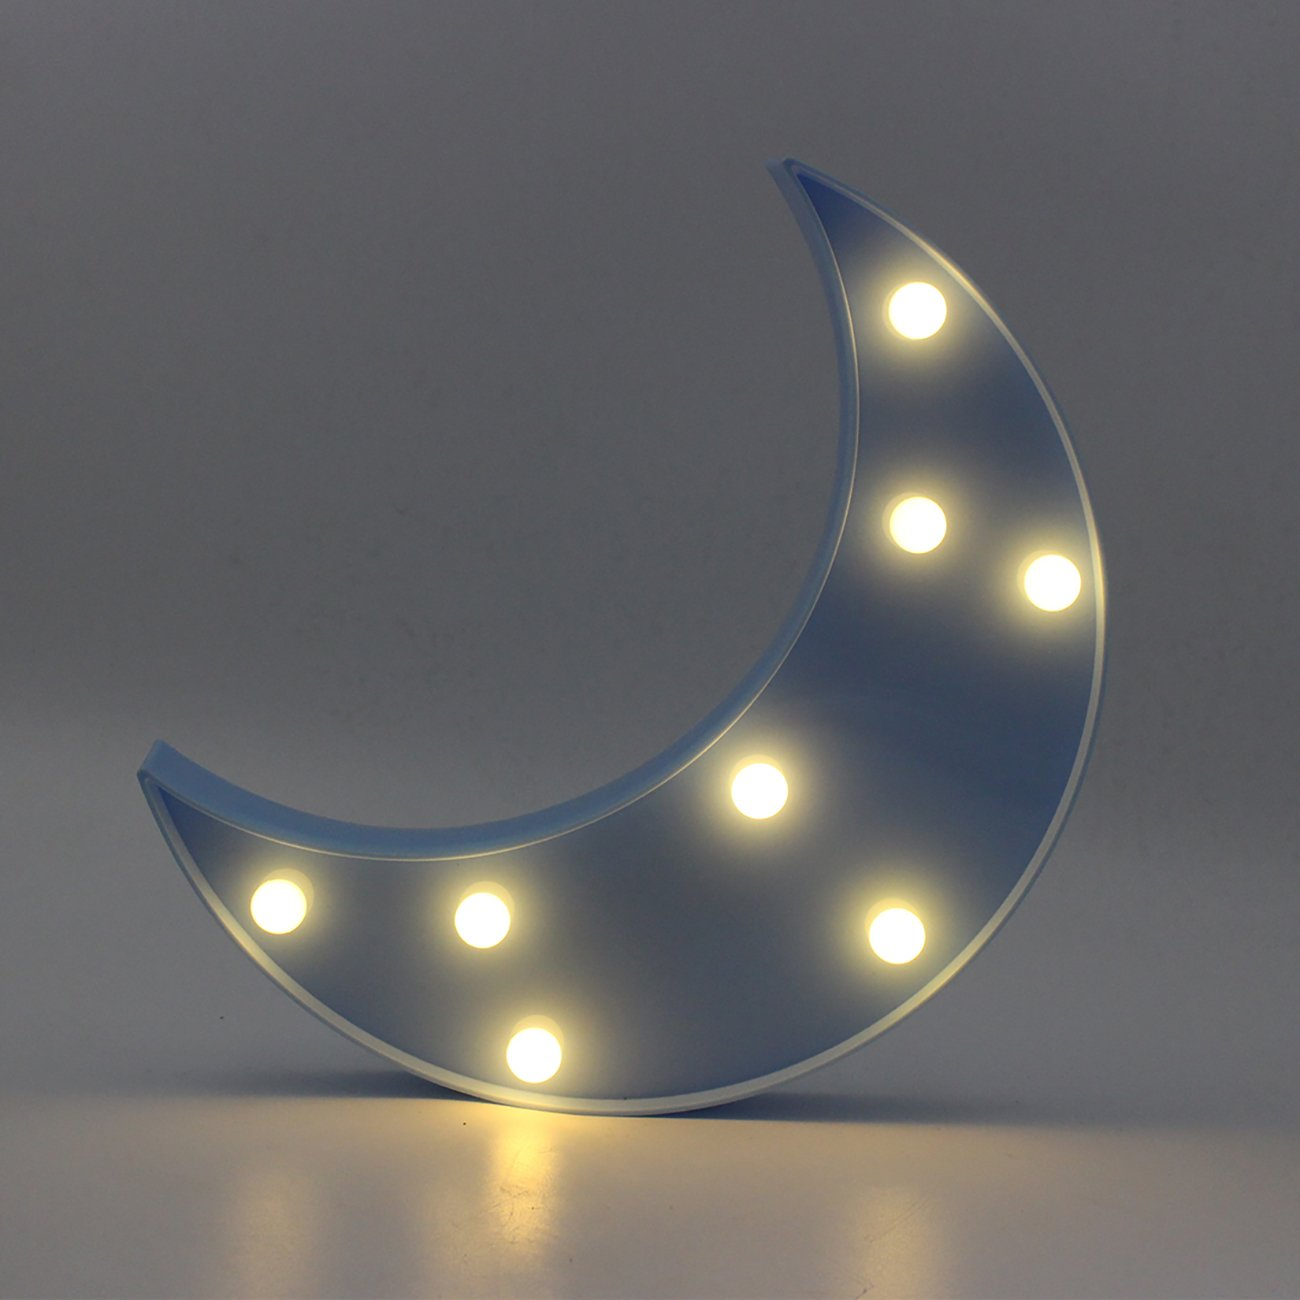 YAEer 3d面白いブラック矢印LEDナイトライト装飾ライトサイン子供赤ちゃんの部屋、パーティー、休日、as Kidギフト ブルー Y3DNL-27  ブルームーン B07CQNFSNY